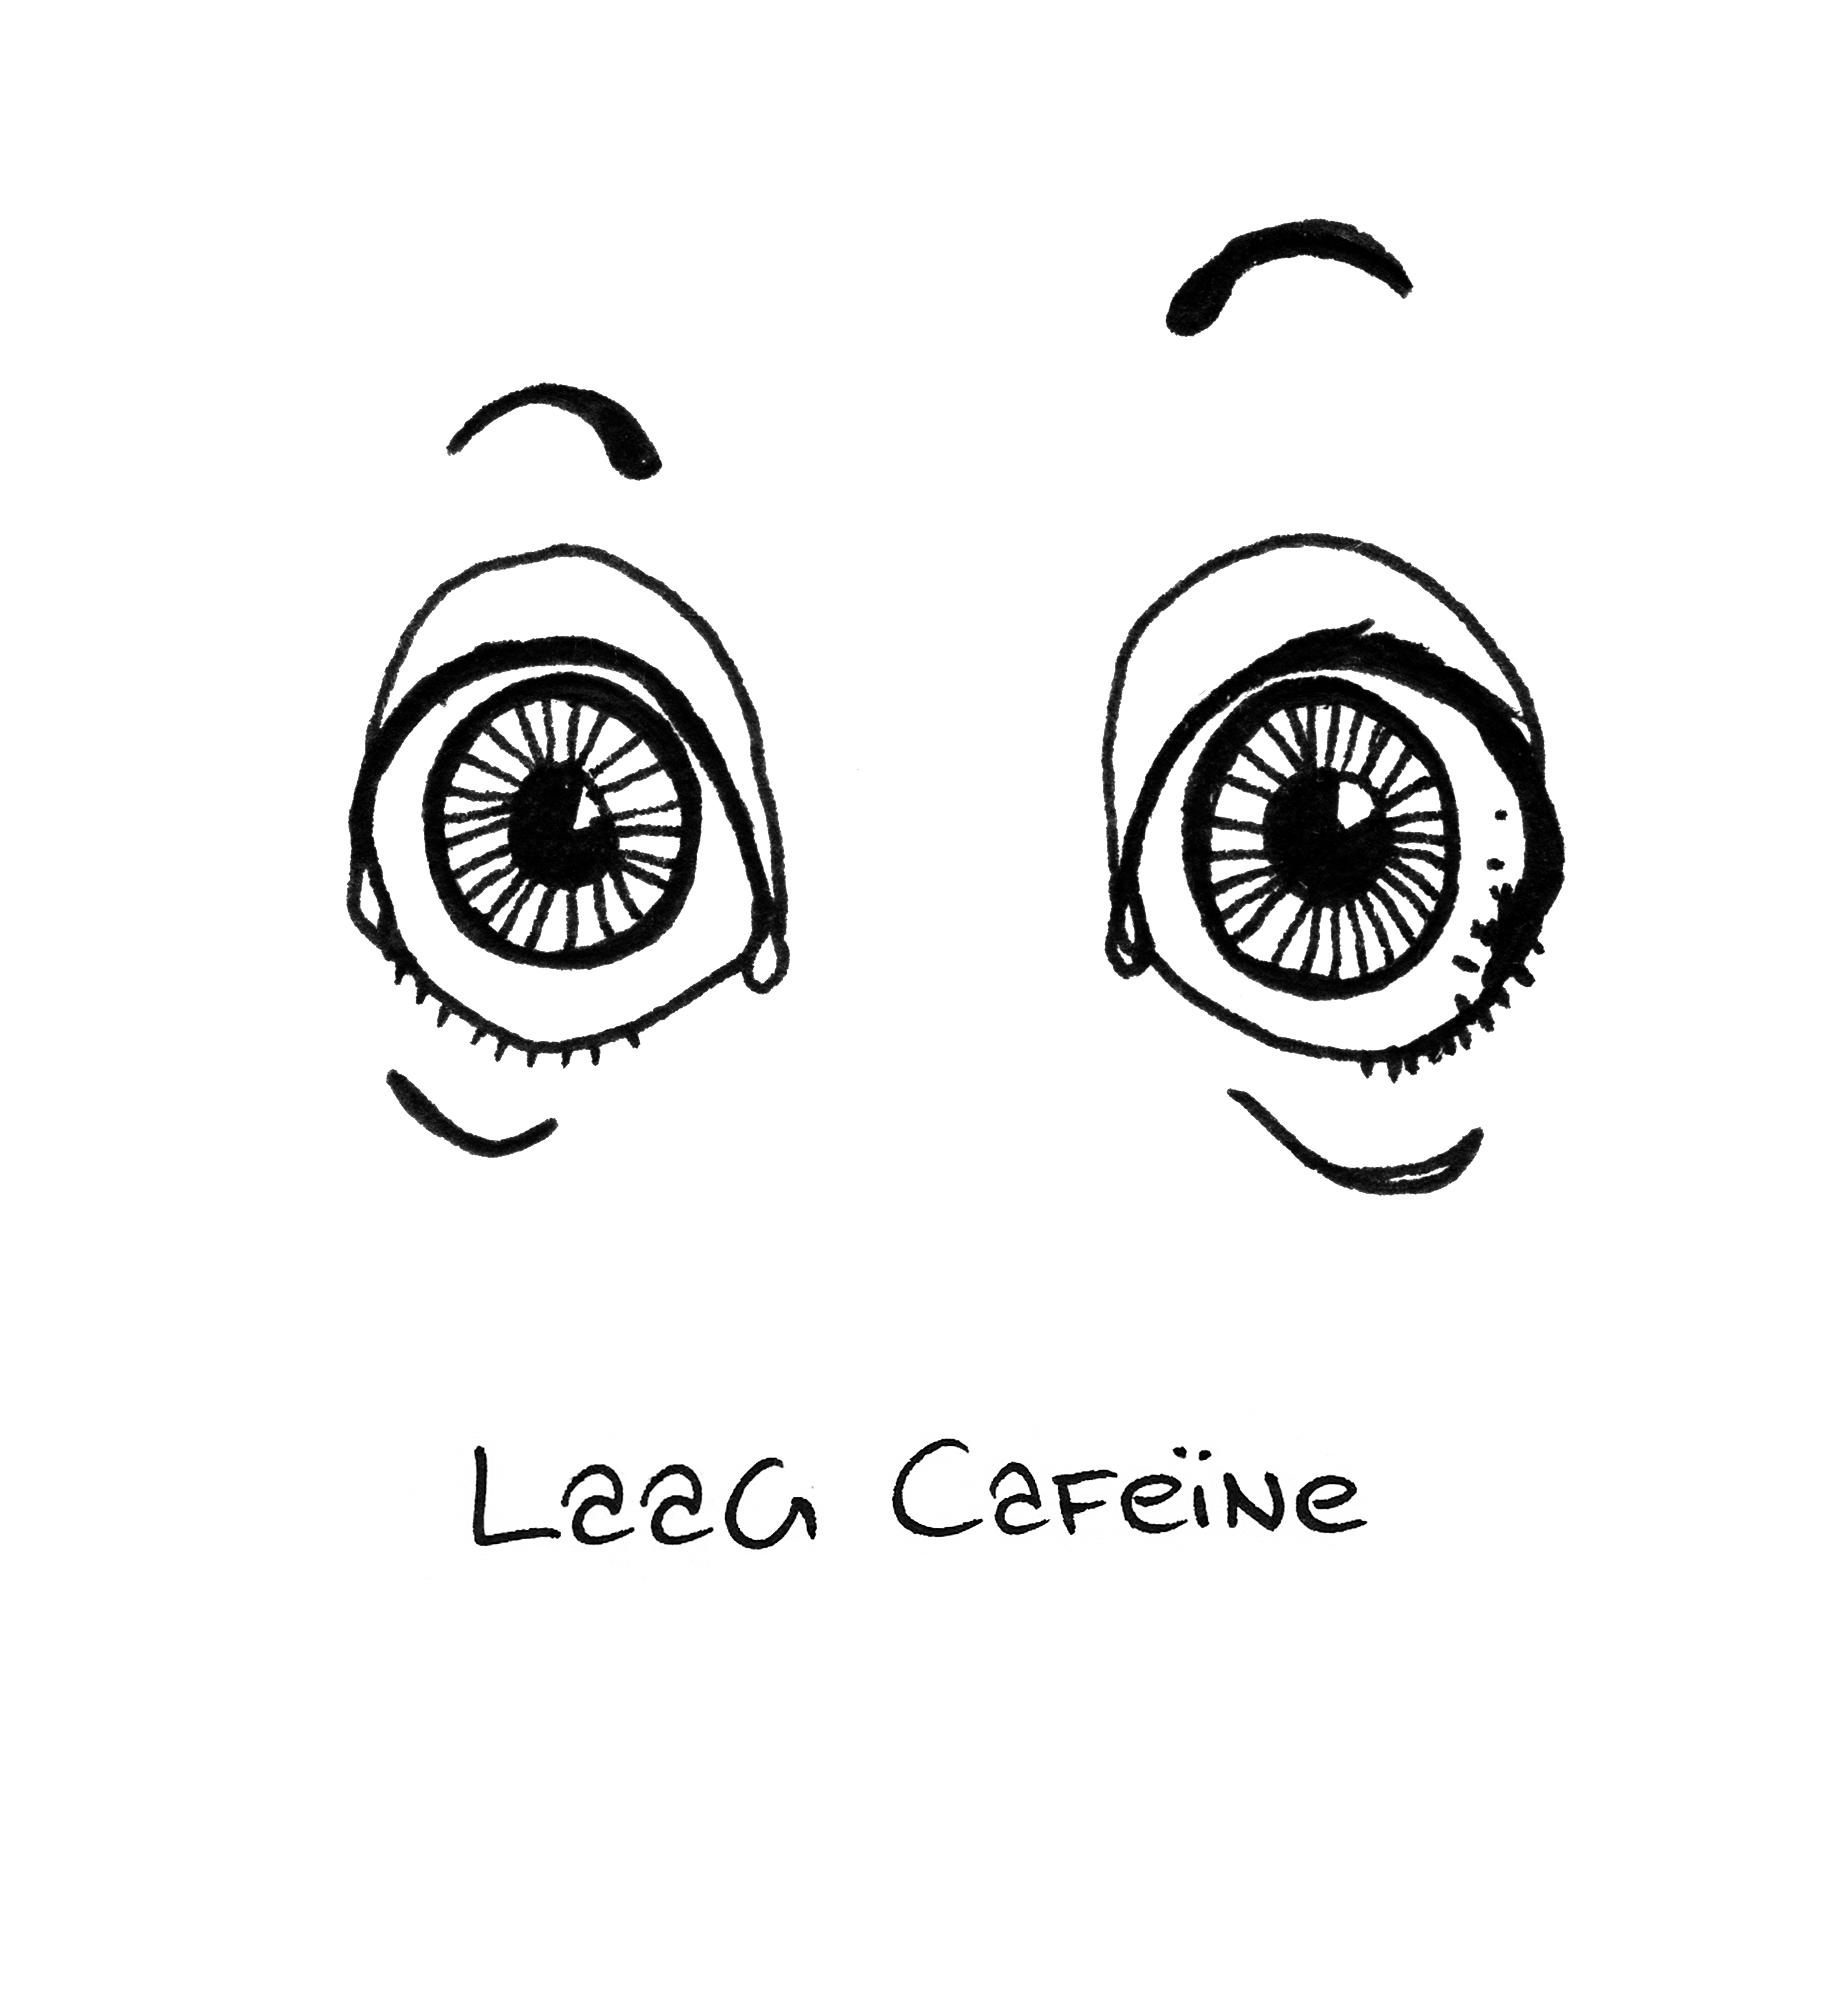 Bevat thee cafeïne?